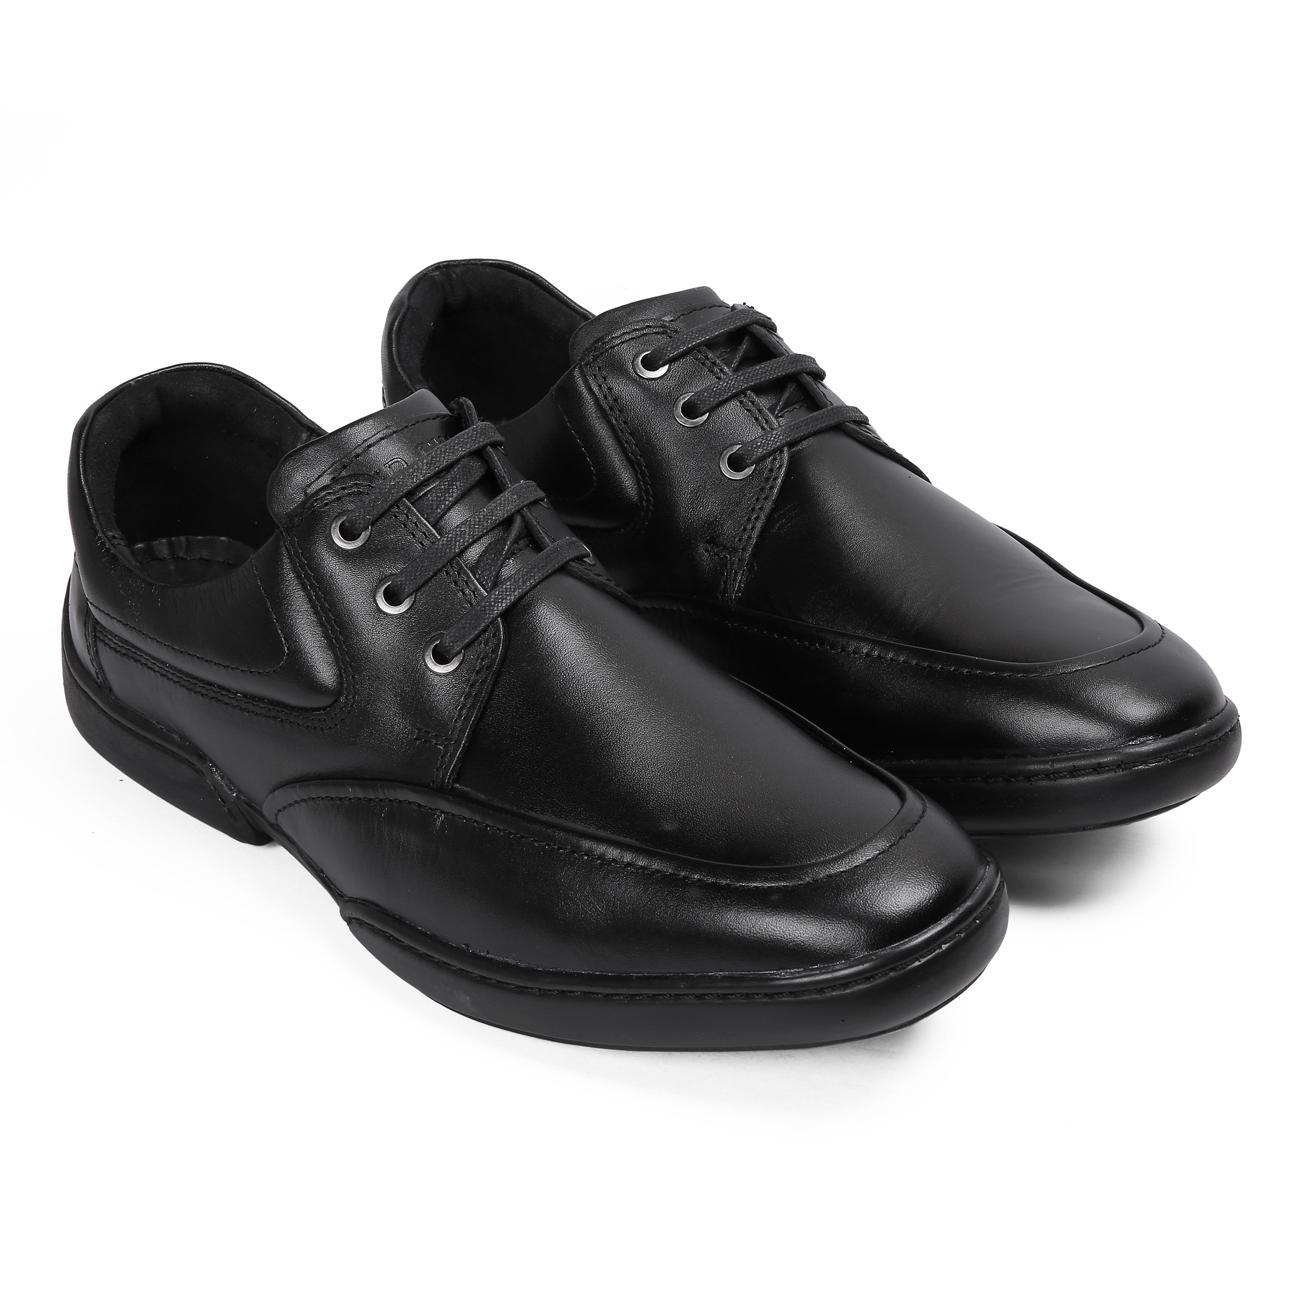 black original leather shoes